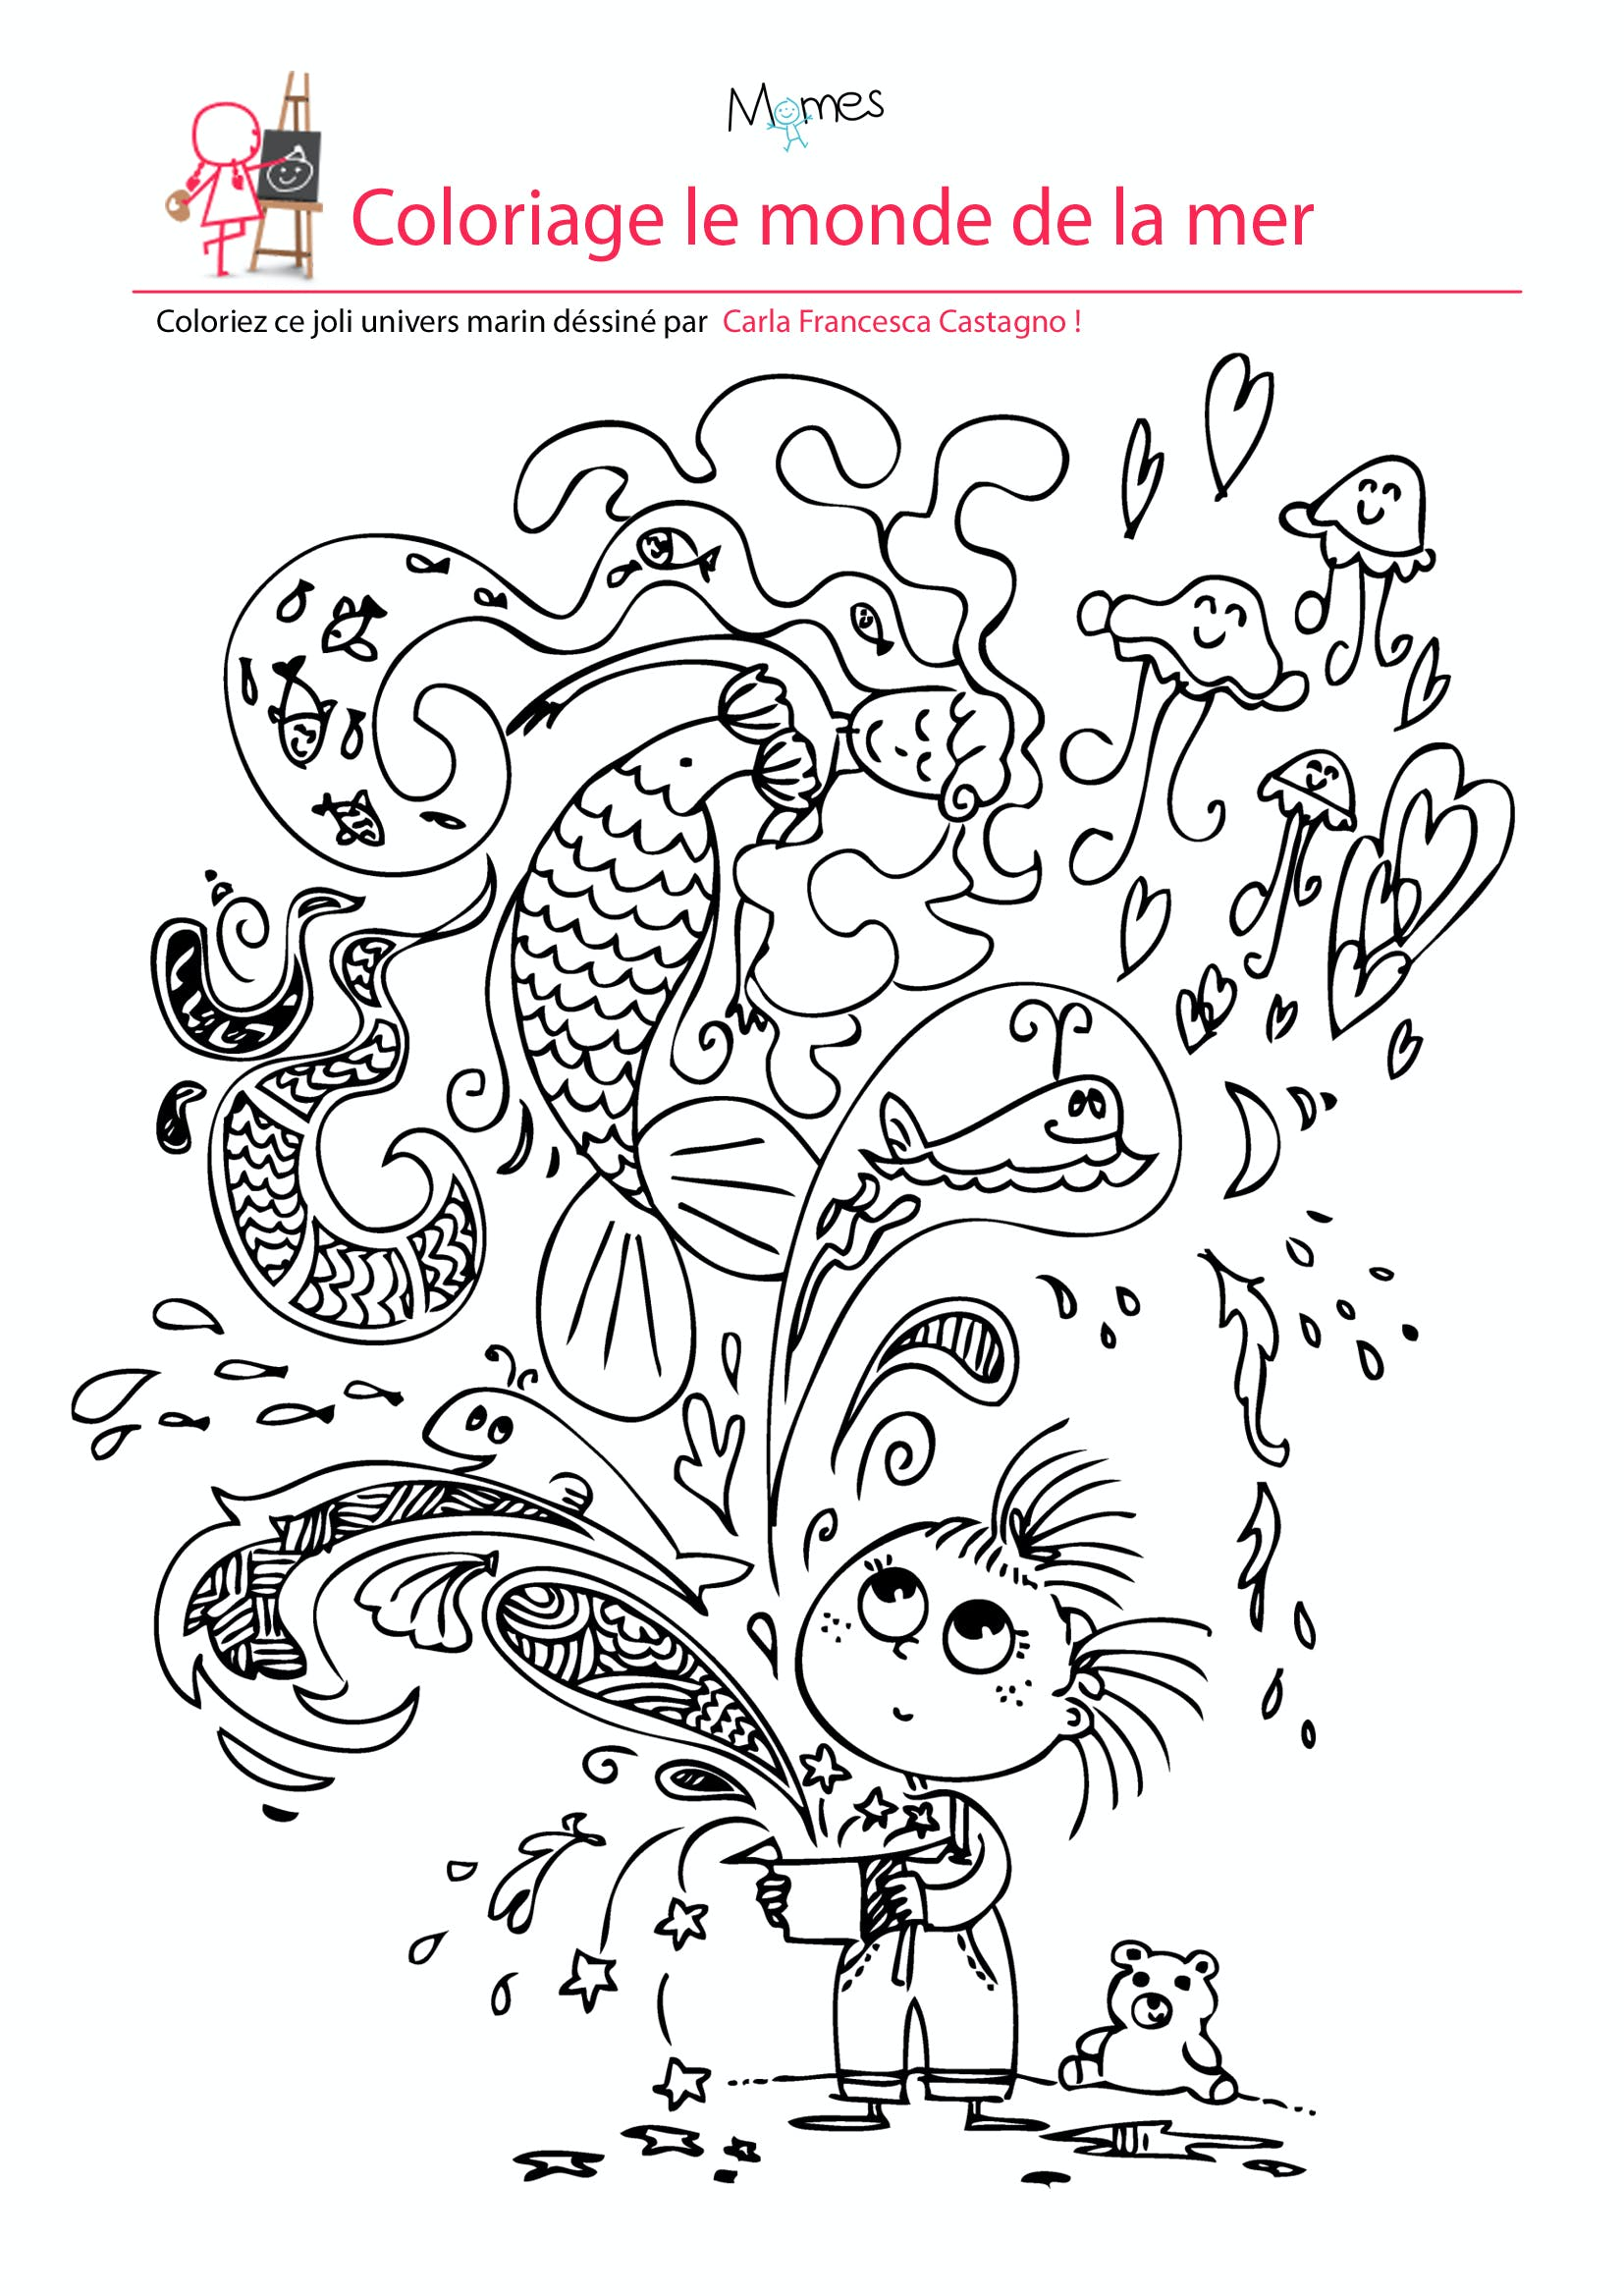 Coloriage le monde de la mer  imprimer